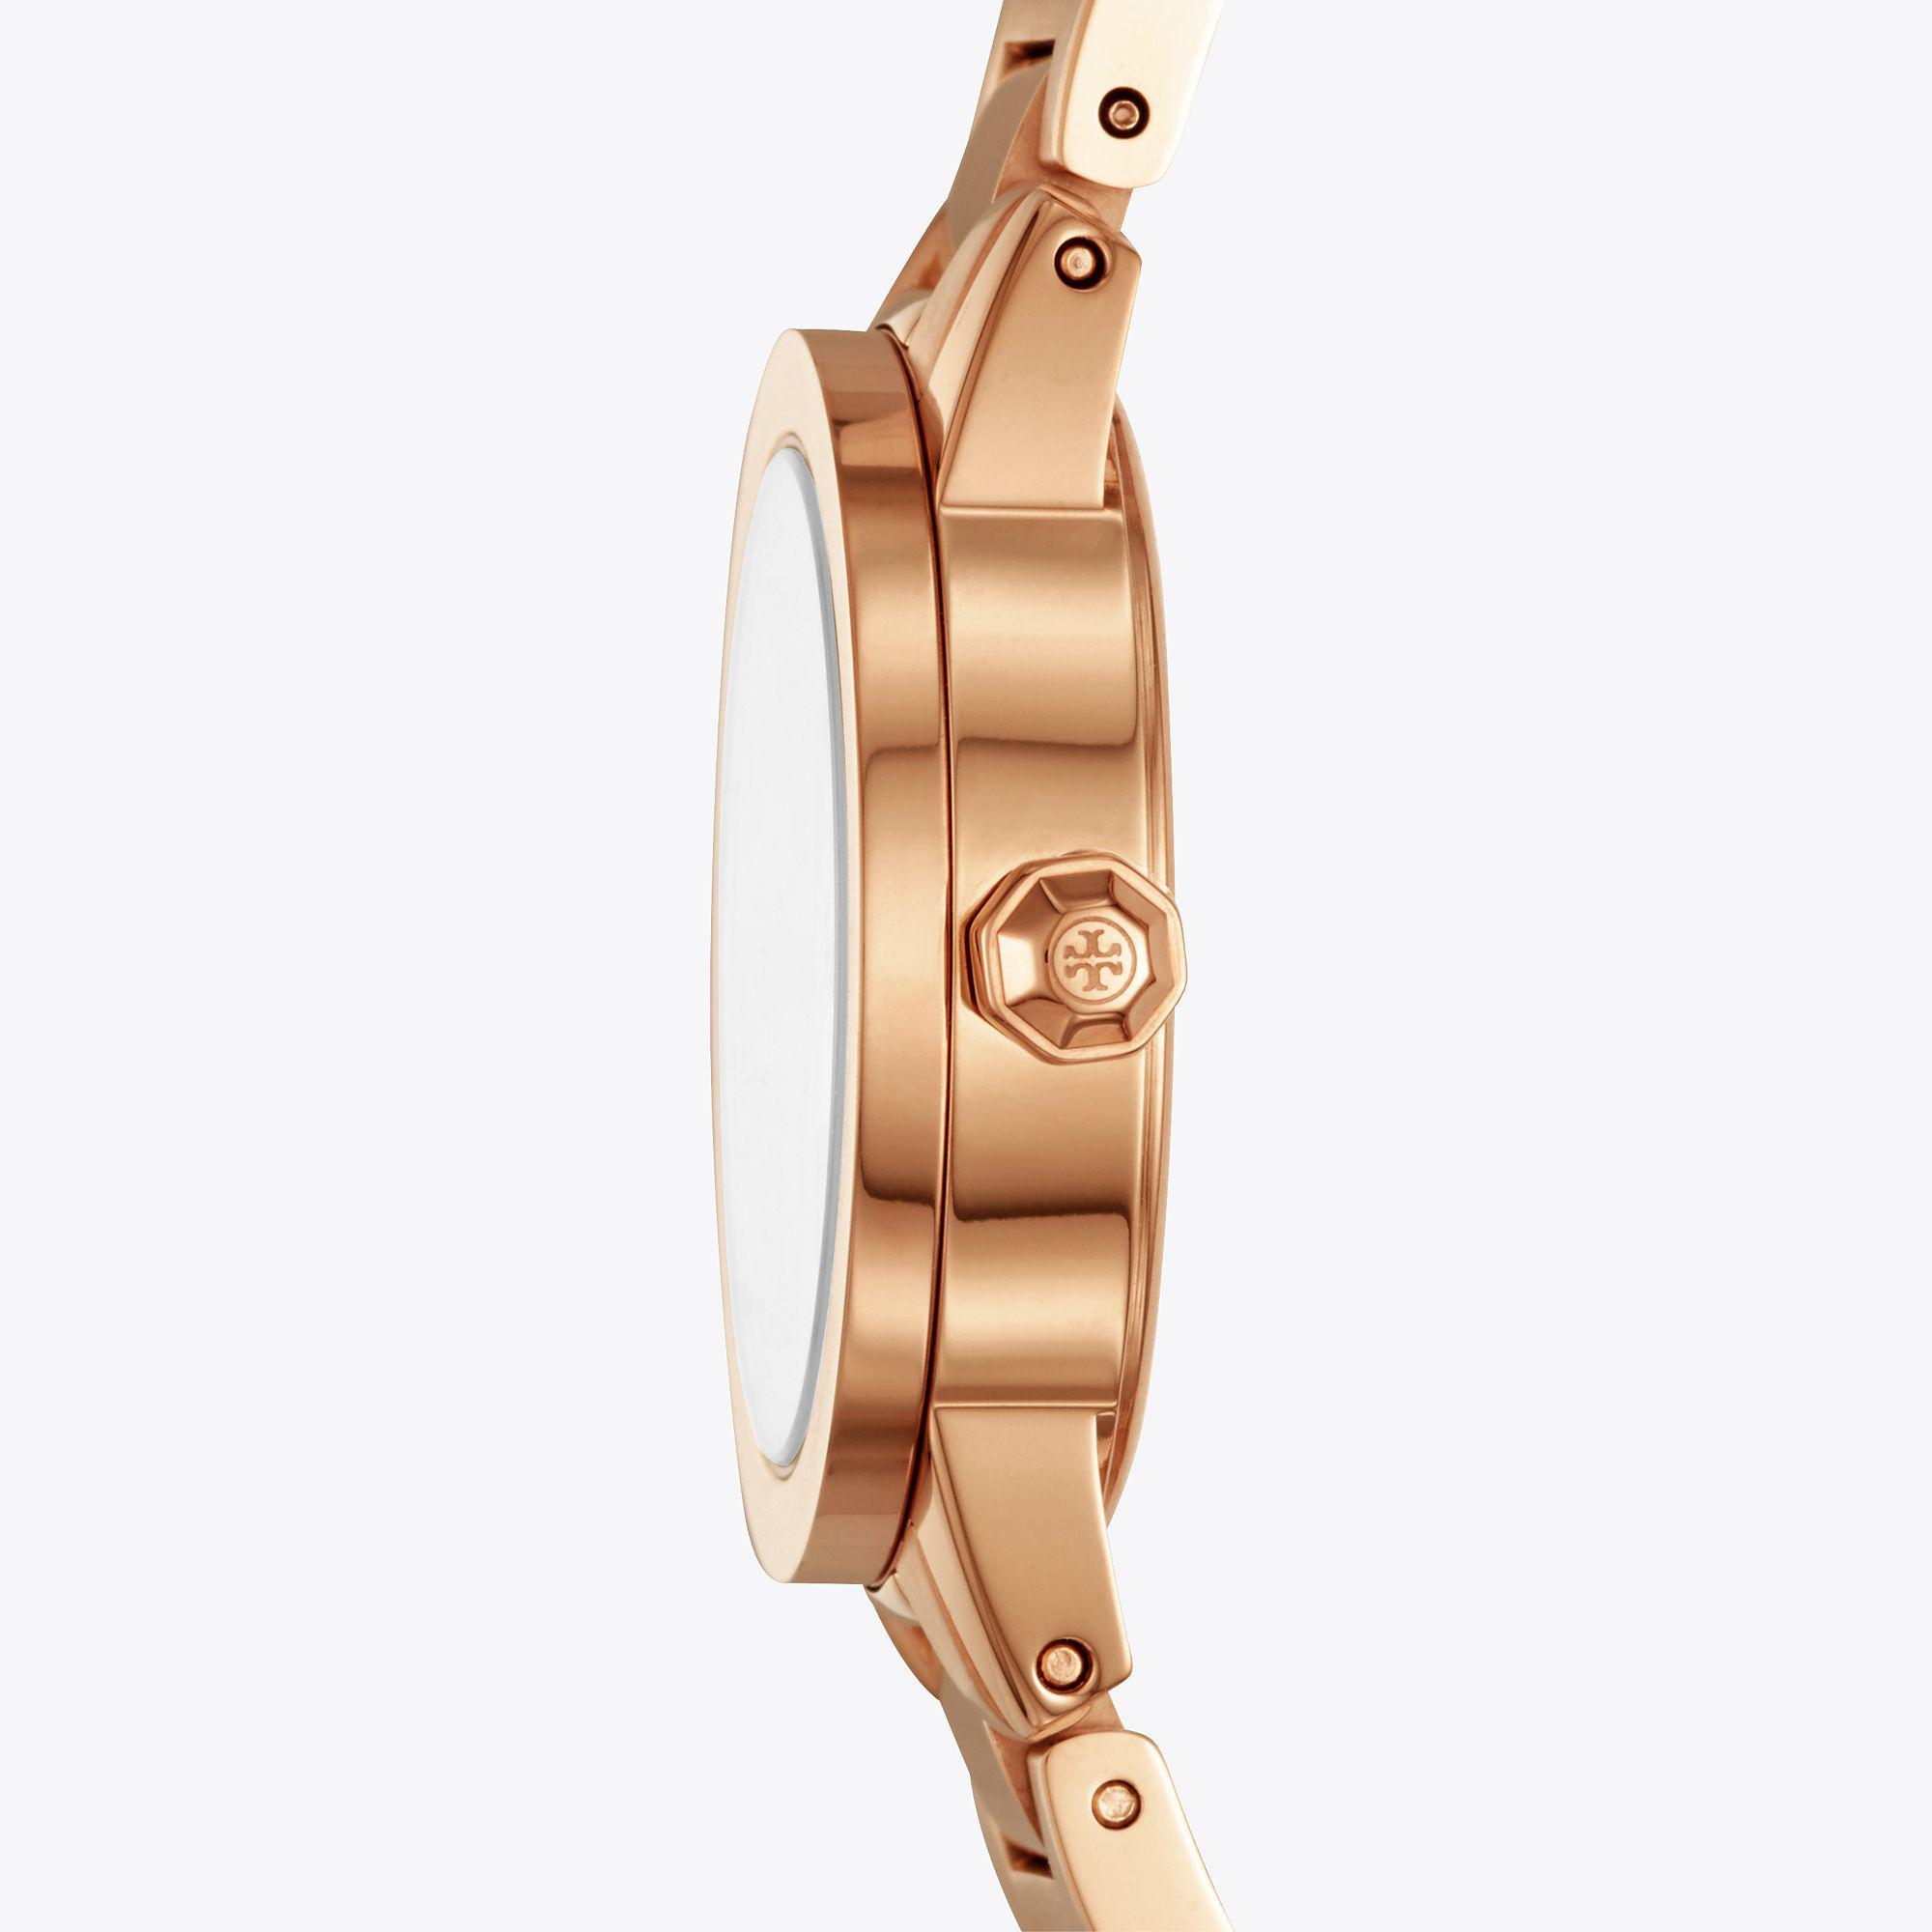 7b71537b81b7 Tory Burch Gigi Watch